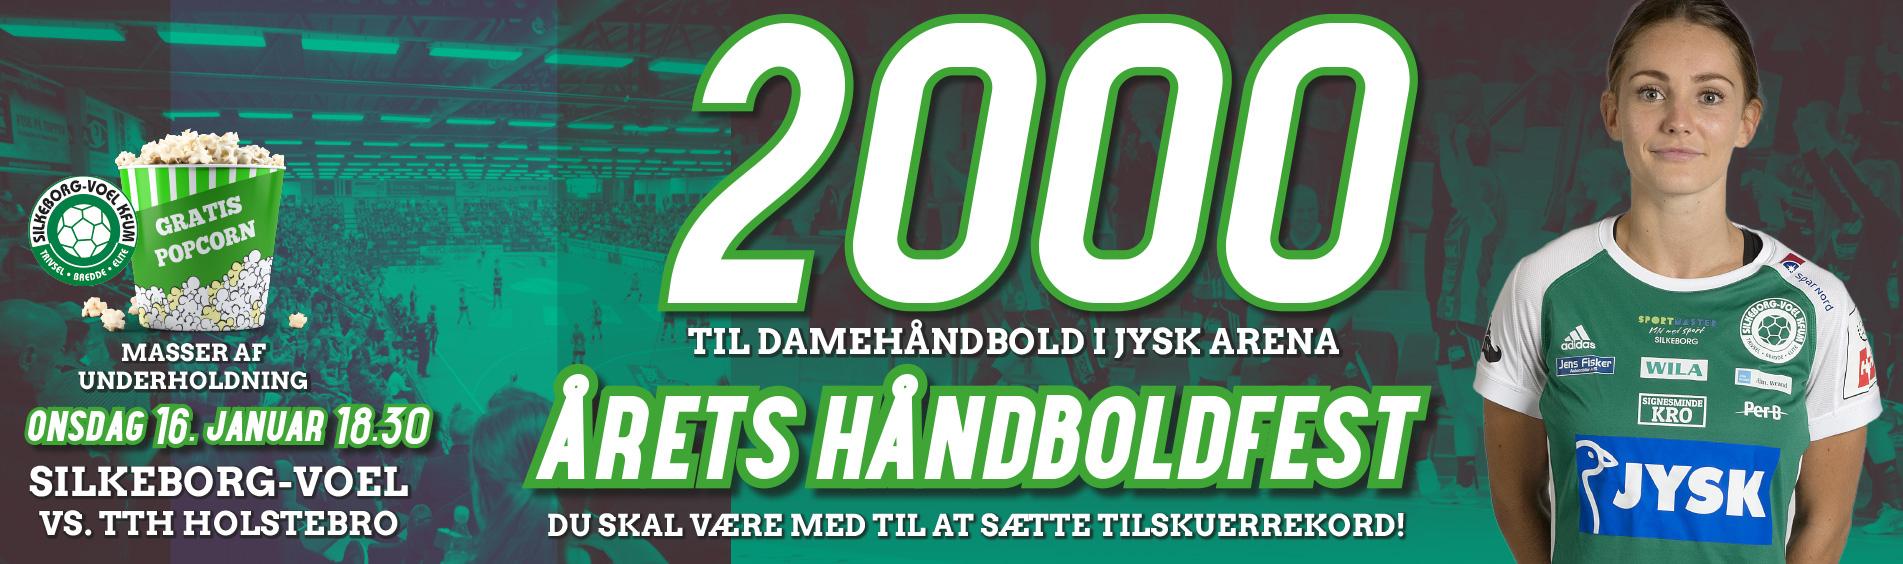 webbanner-2000tildhb